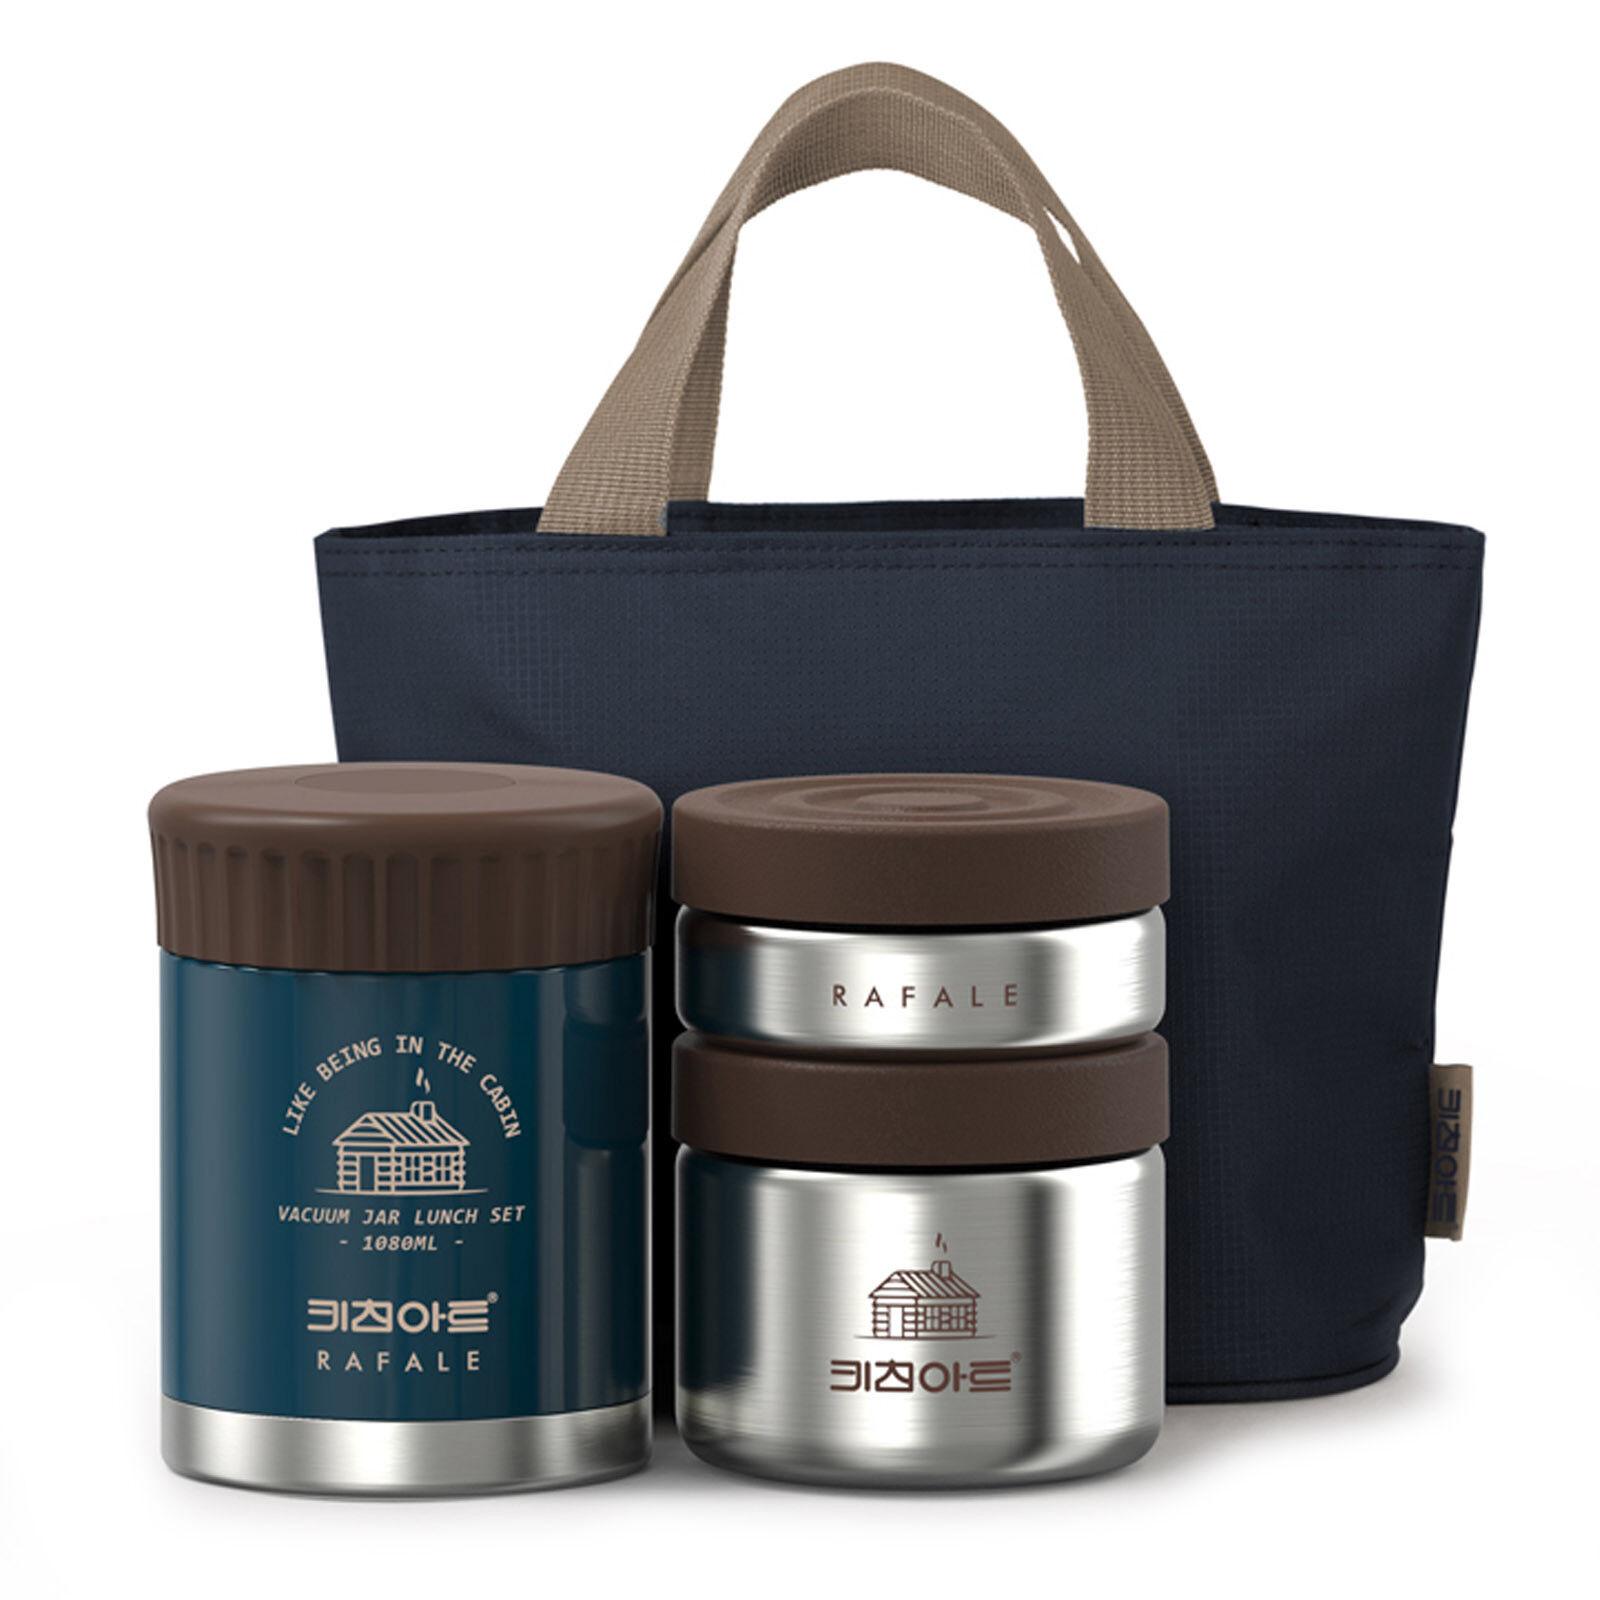 KitchenArt Rafale Cabin Thermal Cooler Bento Lunch Box Set Insulated Storage Bag